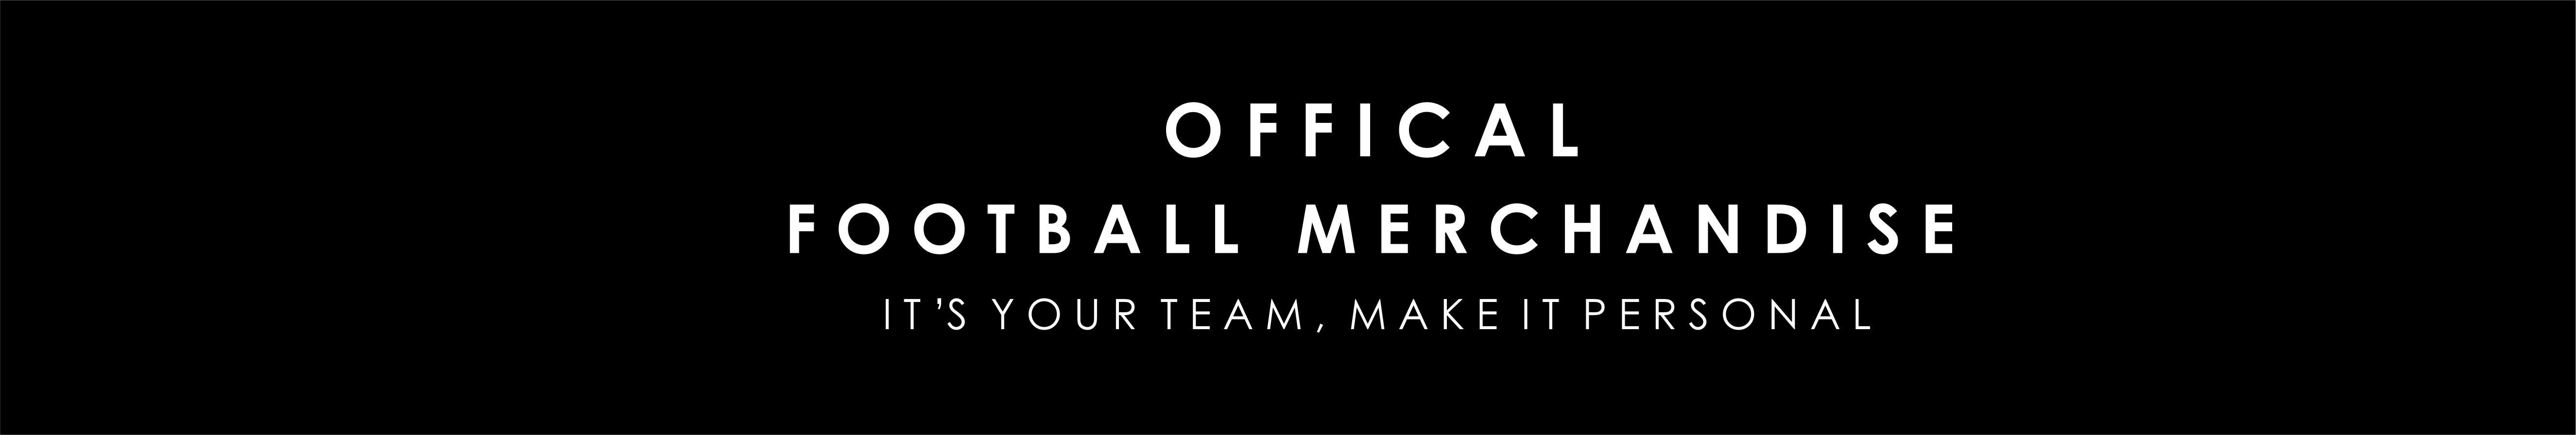 football-merchandise-banner.jpg